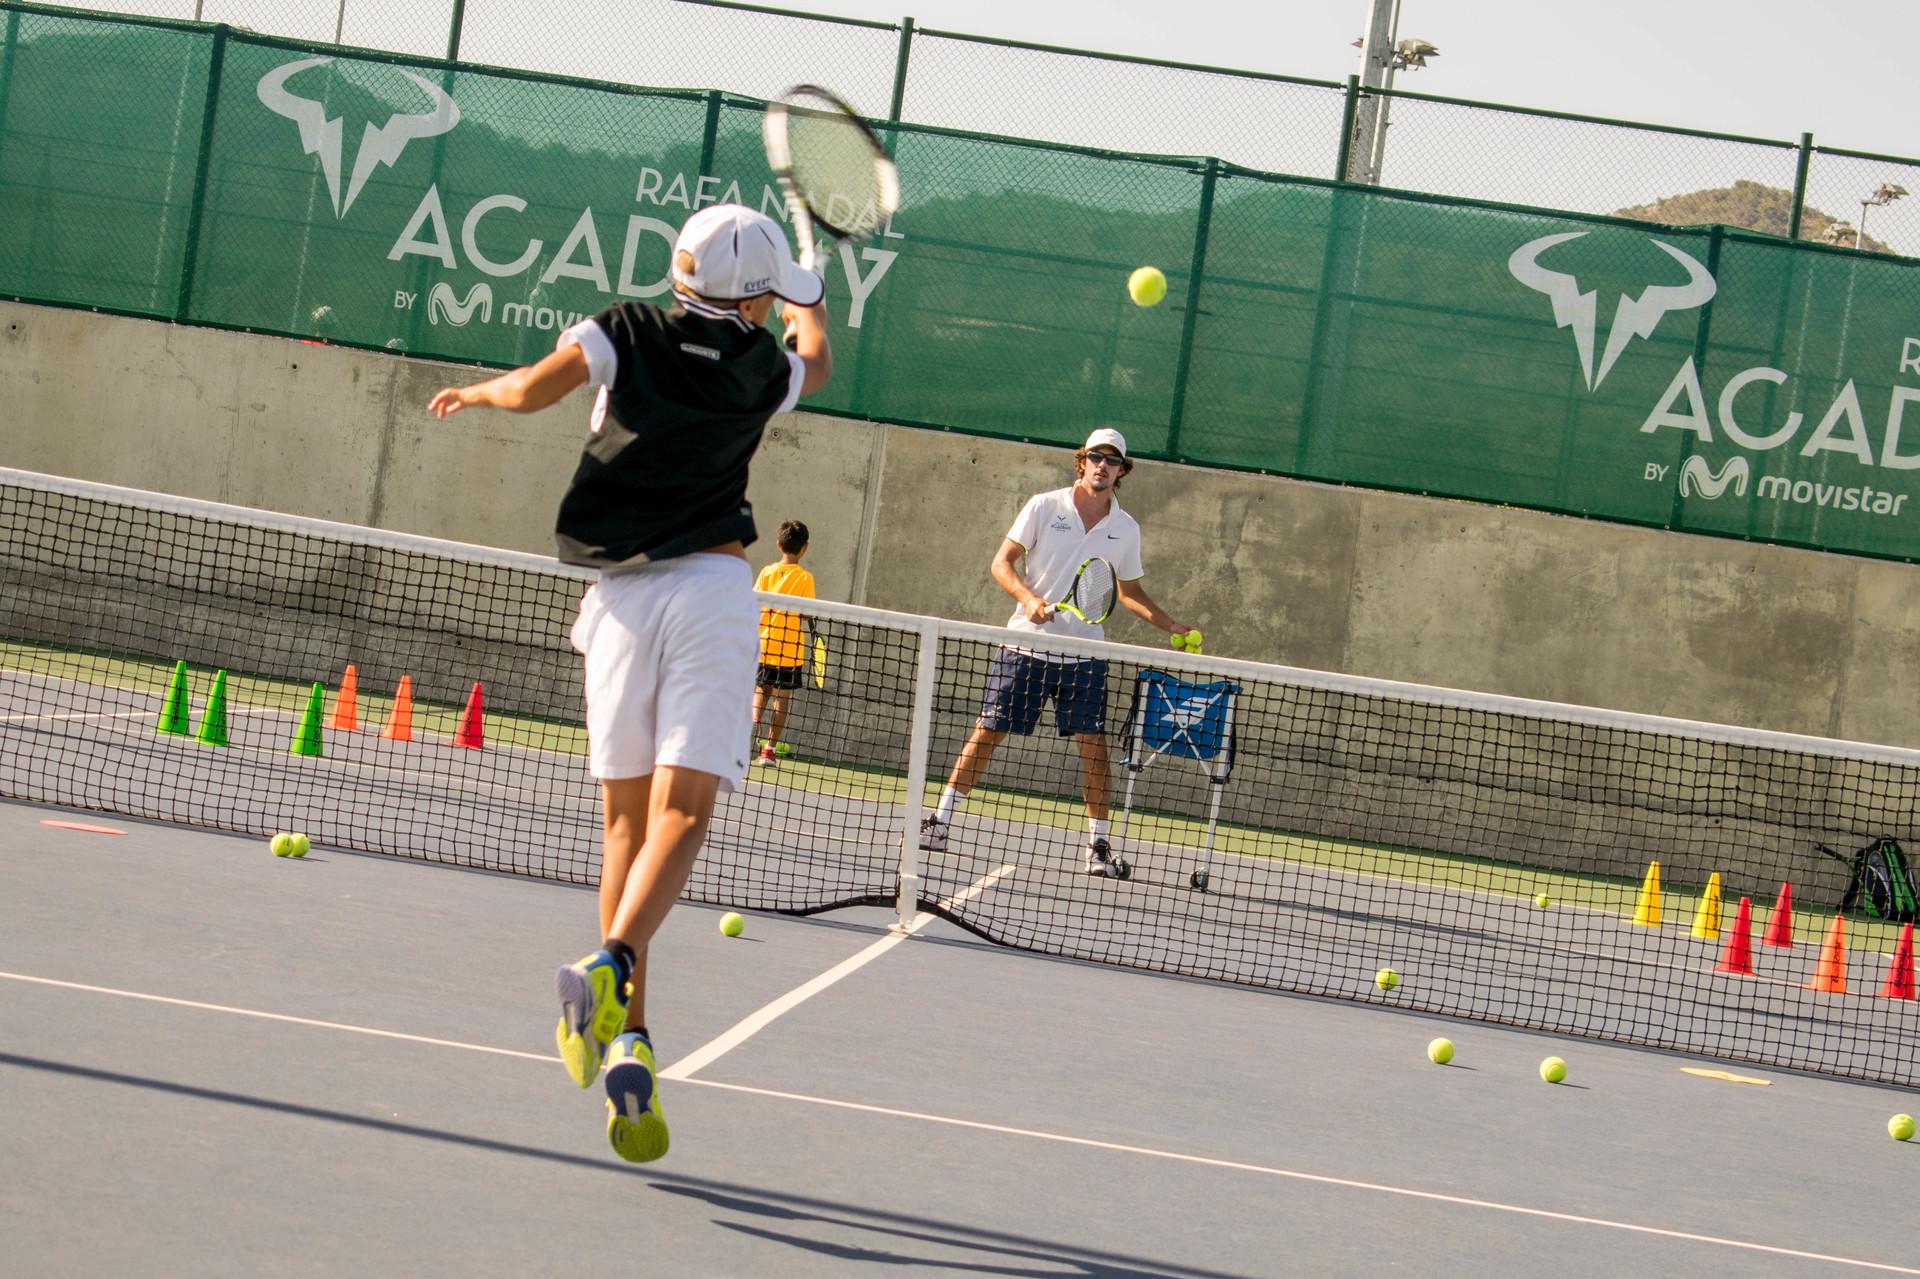 Rafa Nadal Academy USA - 6 Day Tennis Camp